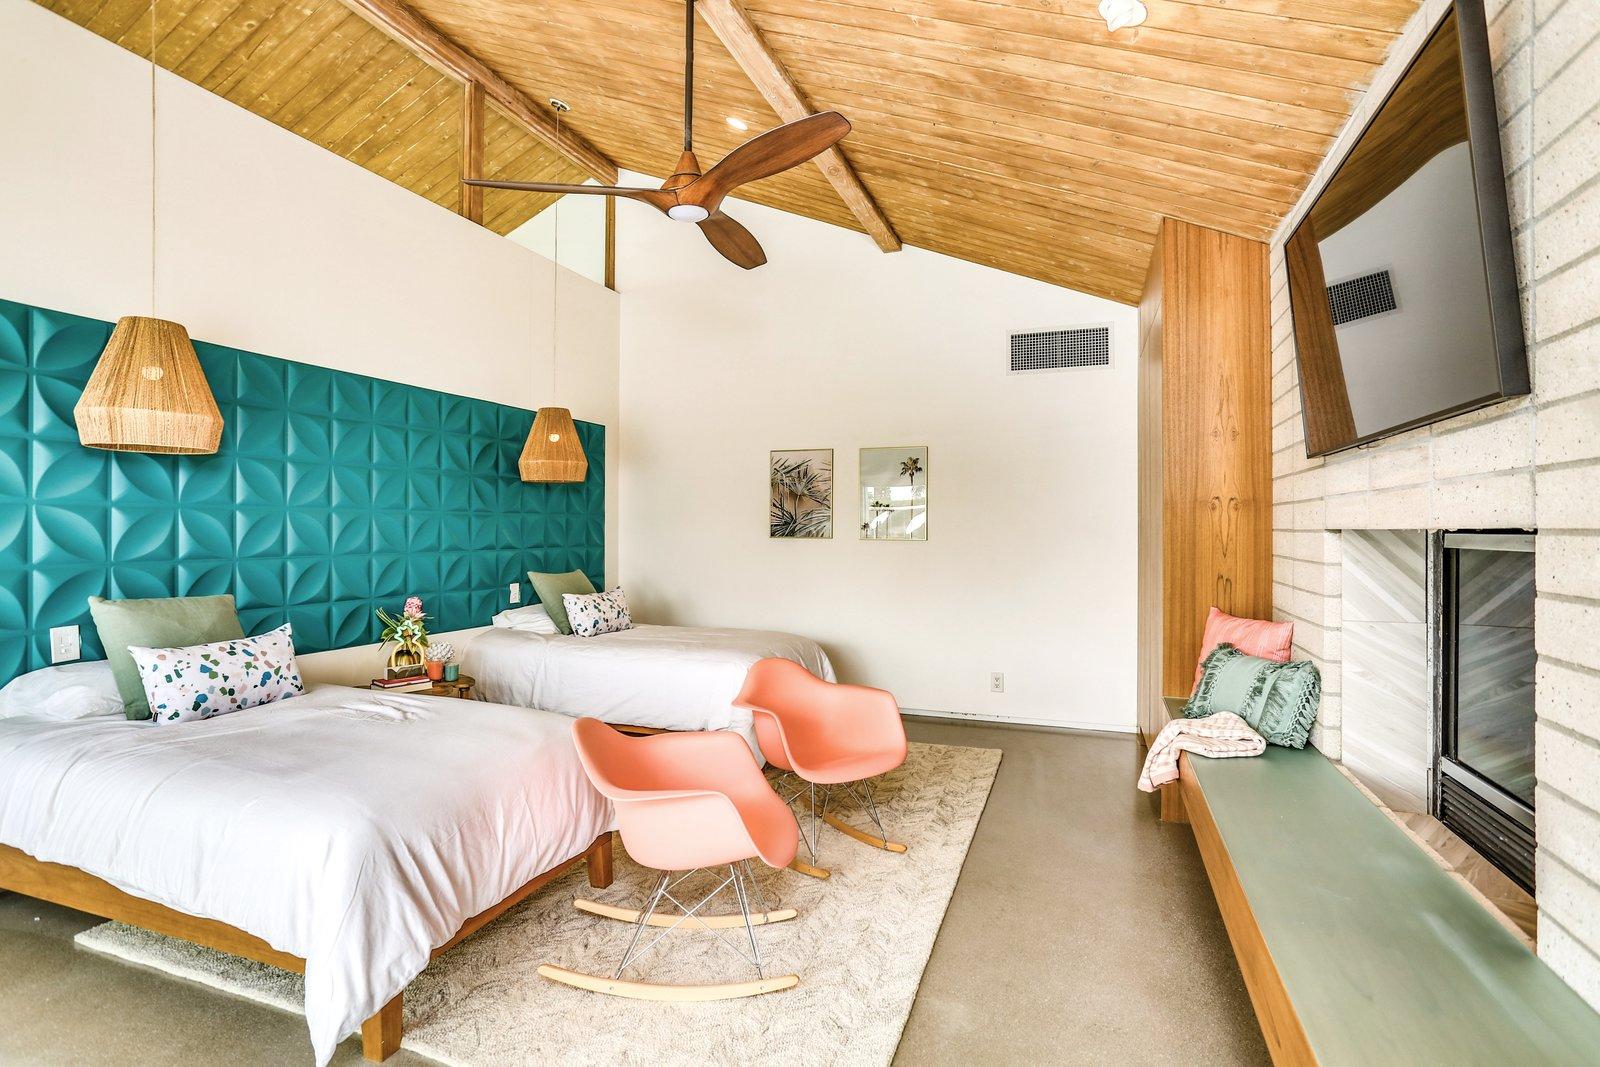 Swiss Miss A-frame bedroom